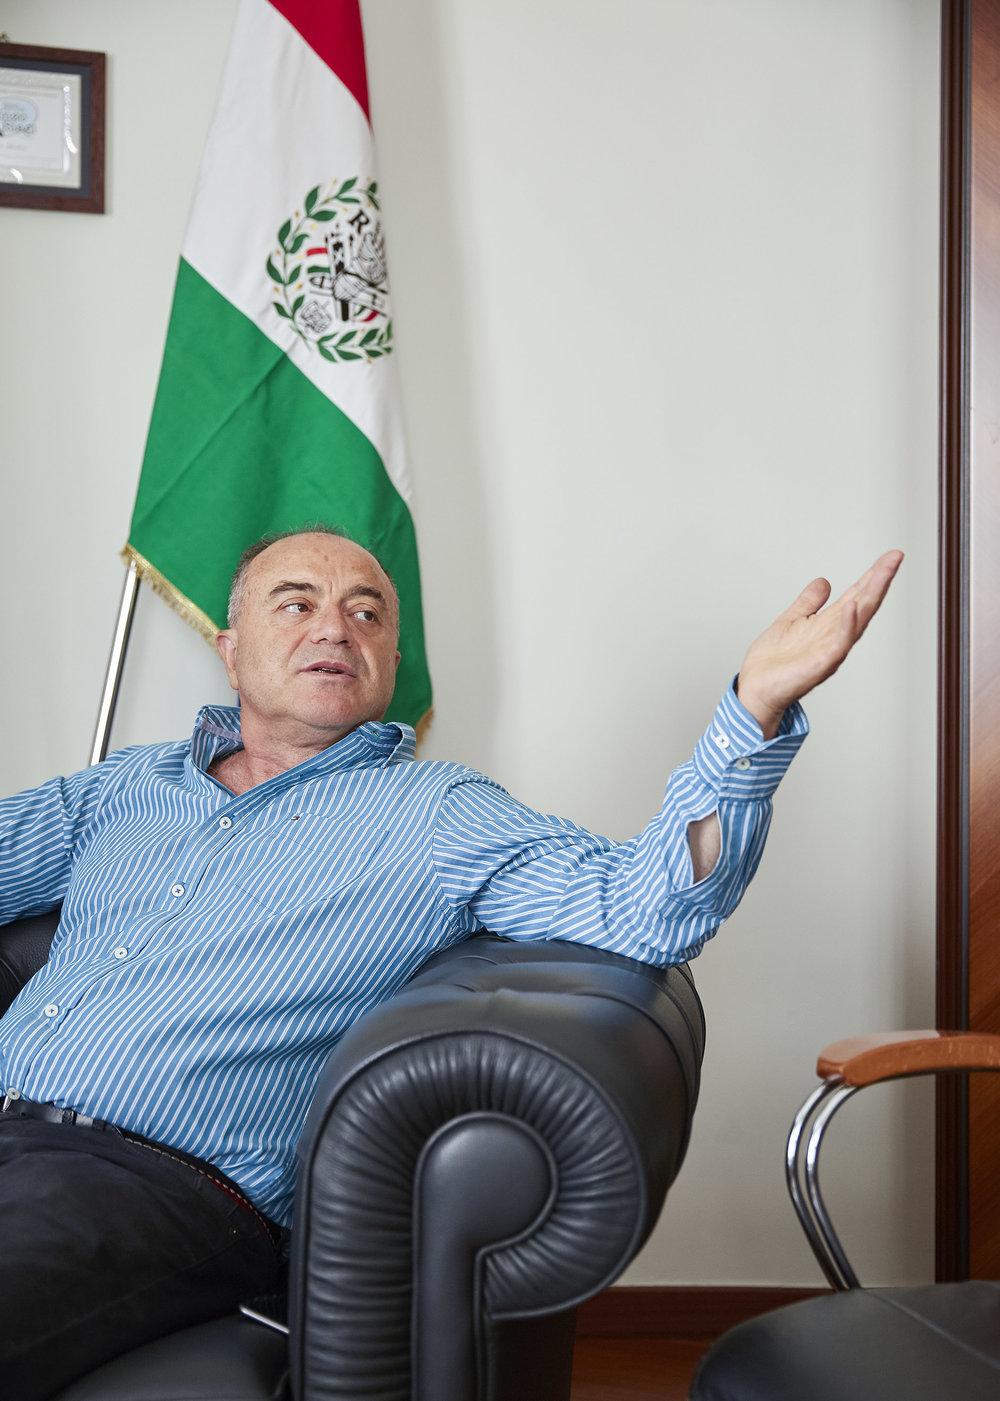 Nicola Gratteri, federal prosecutor